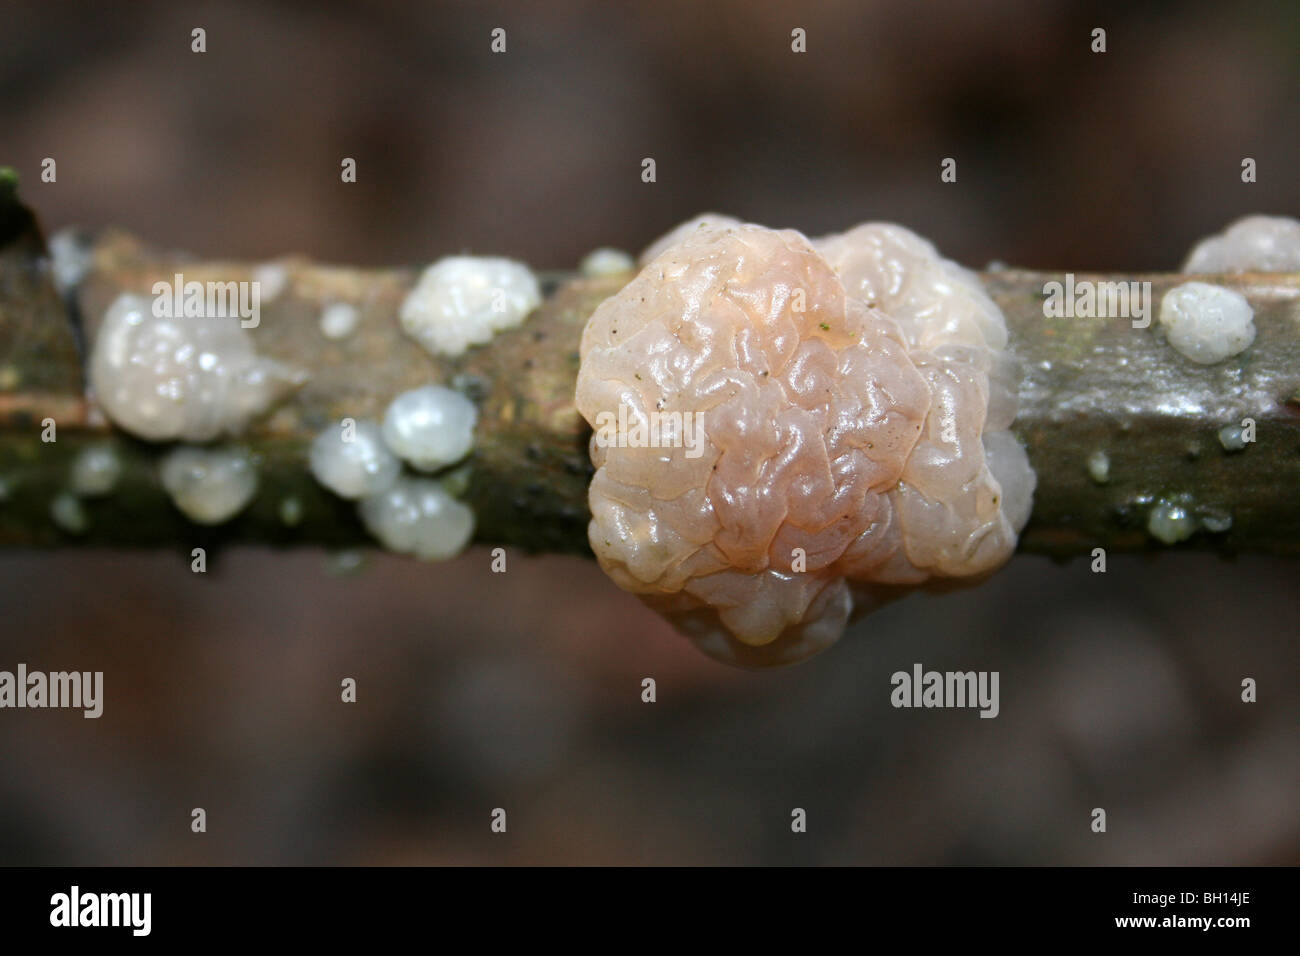 Crystal Brain Fungus Exidia nucleata Taken at Pennington Flash CP, Gtr Manchester, UK - Stock Image